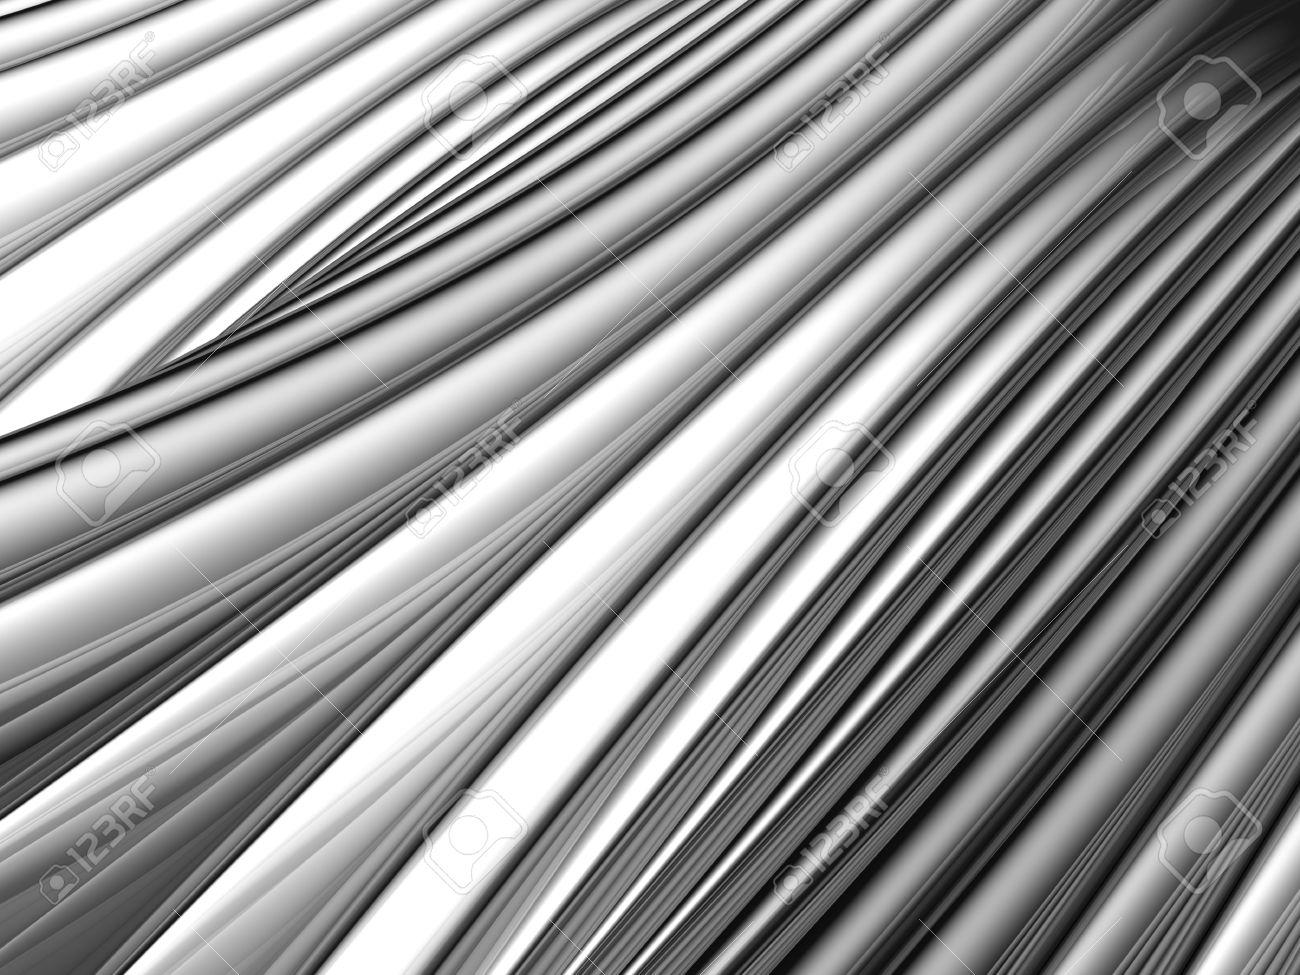 Abstract silver aluminium stripe background 3d illustration Stock Photo - 7454563